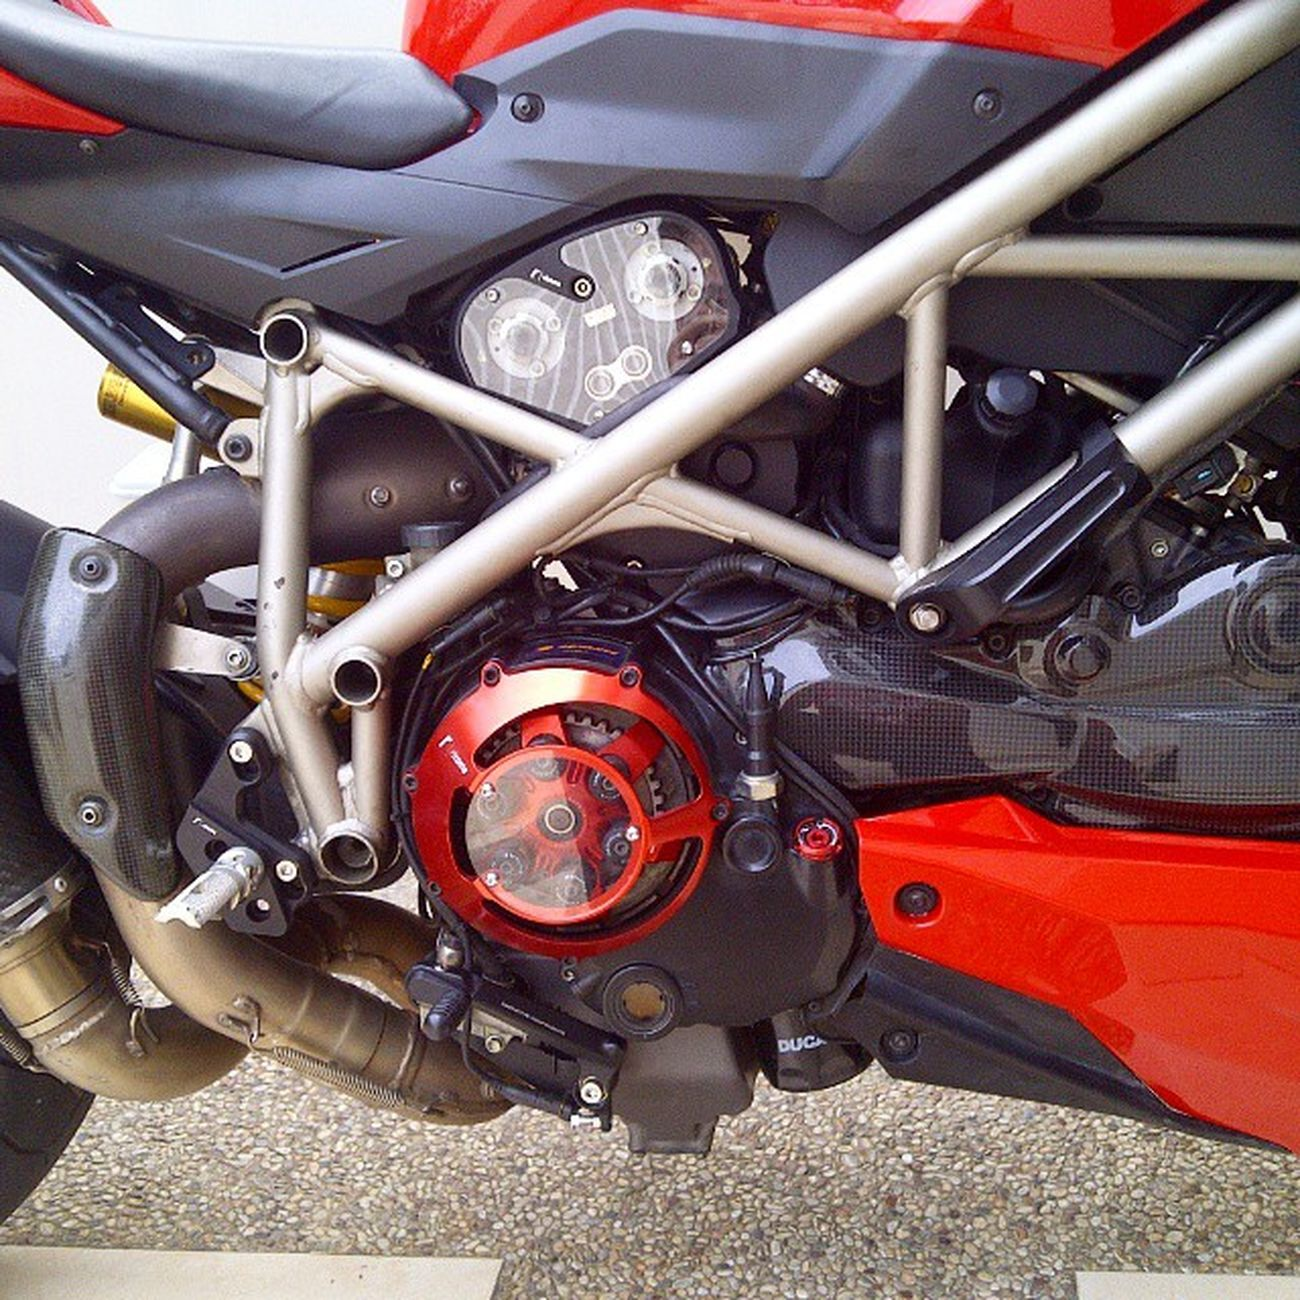 Ducati Streetfighter Ducatistreetfighter Ducatisti Ducatista S 1098 Carbon Rizoma Ohlins Brembo  Pirelli Dryclutch @ducatisofinstagram